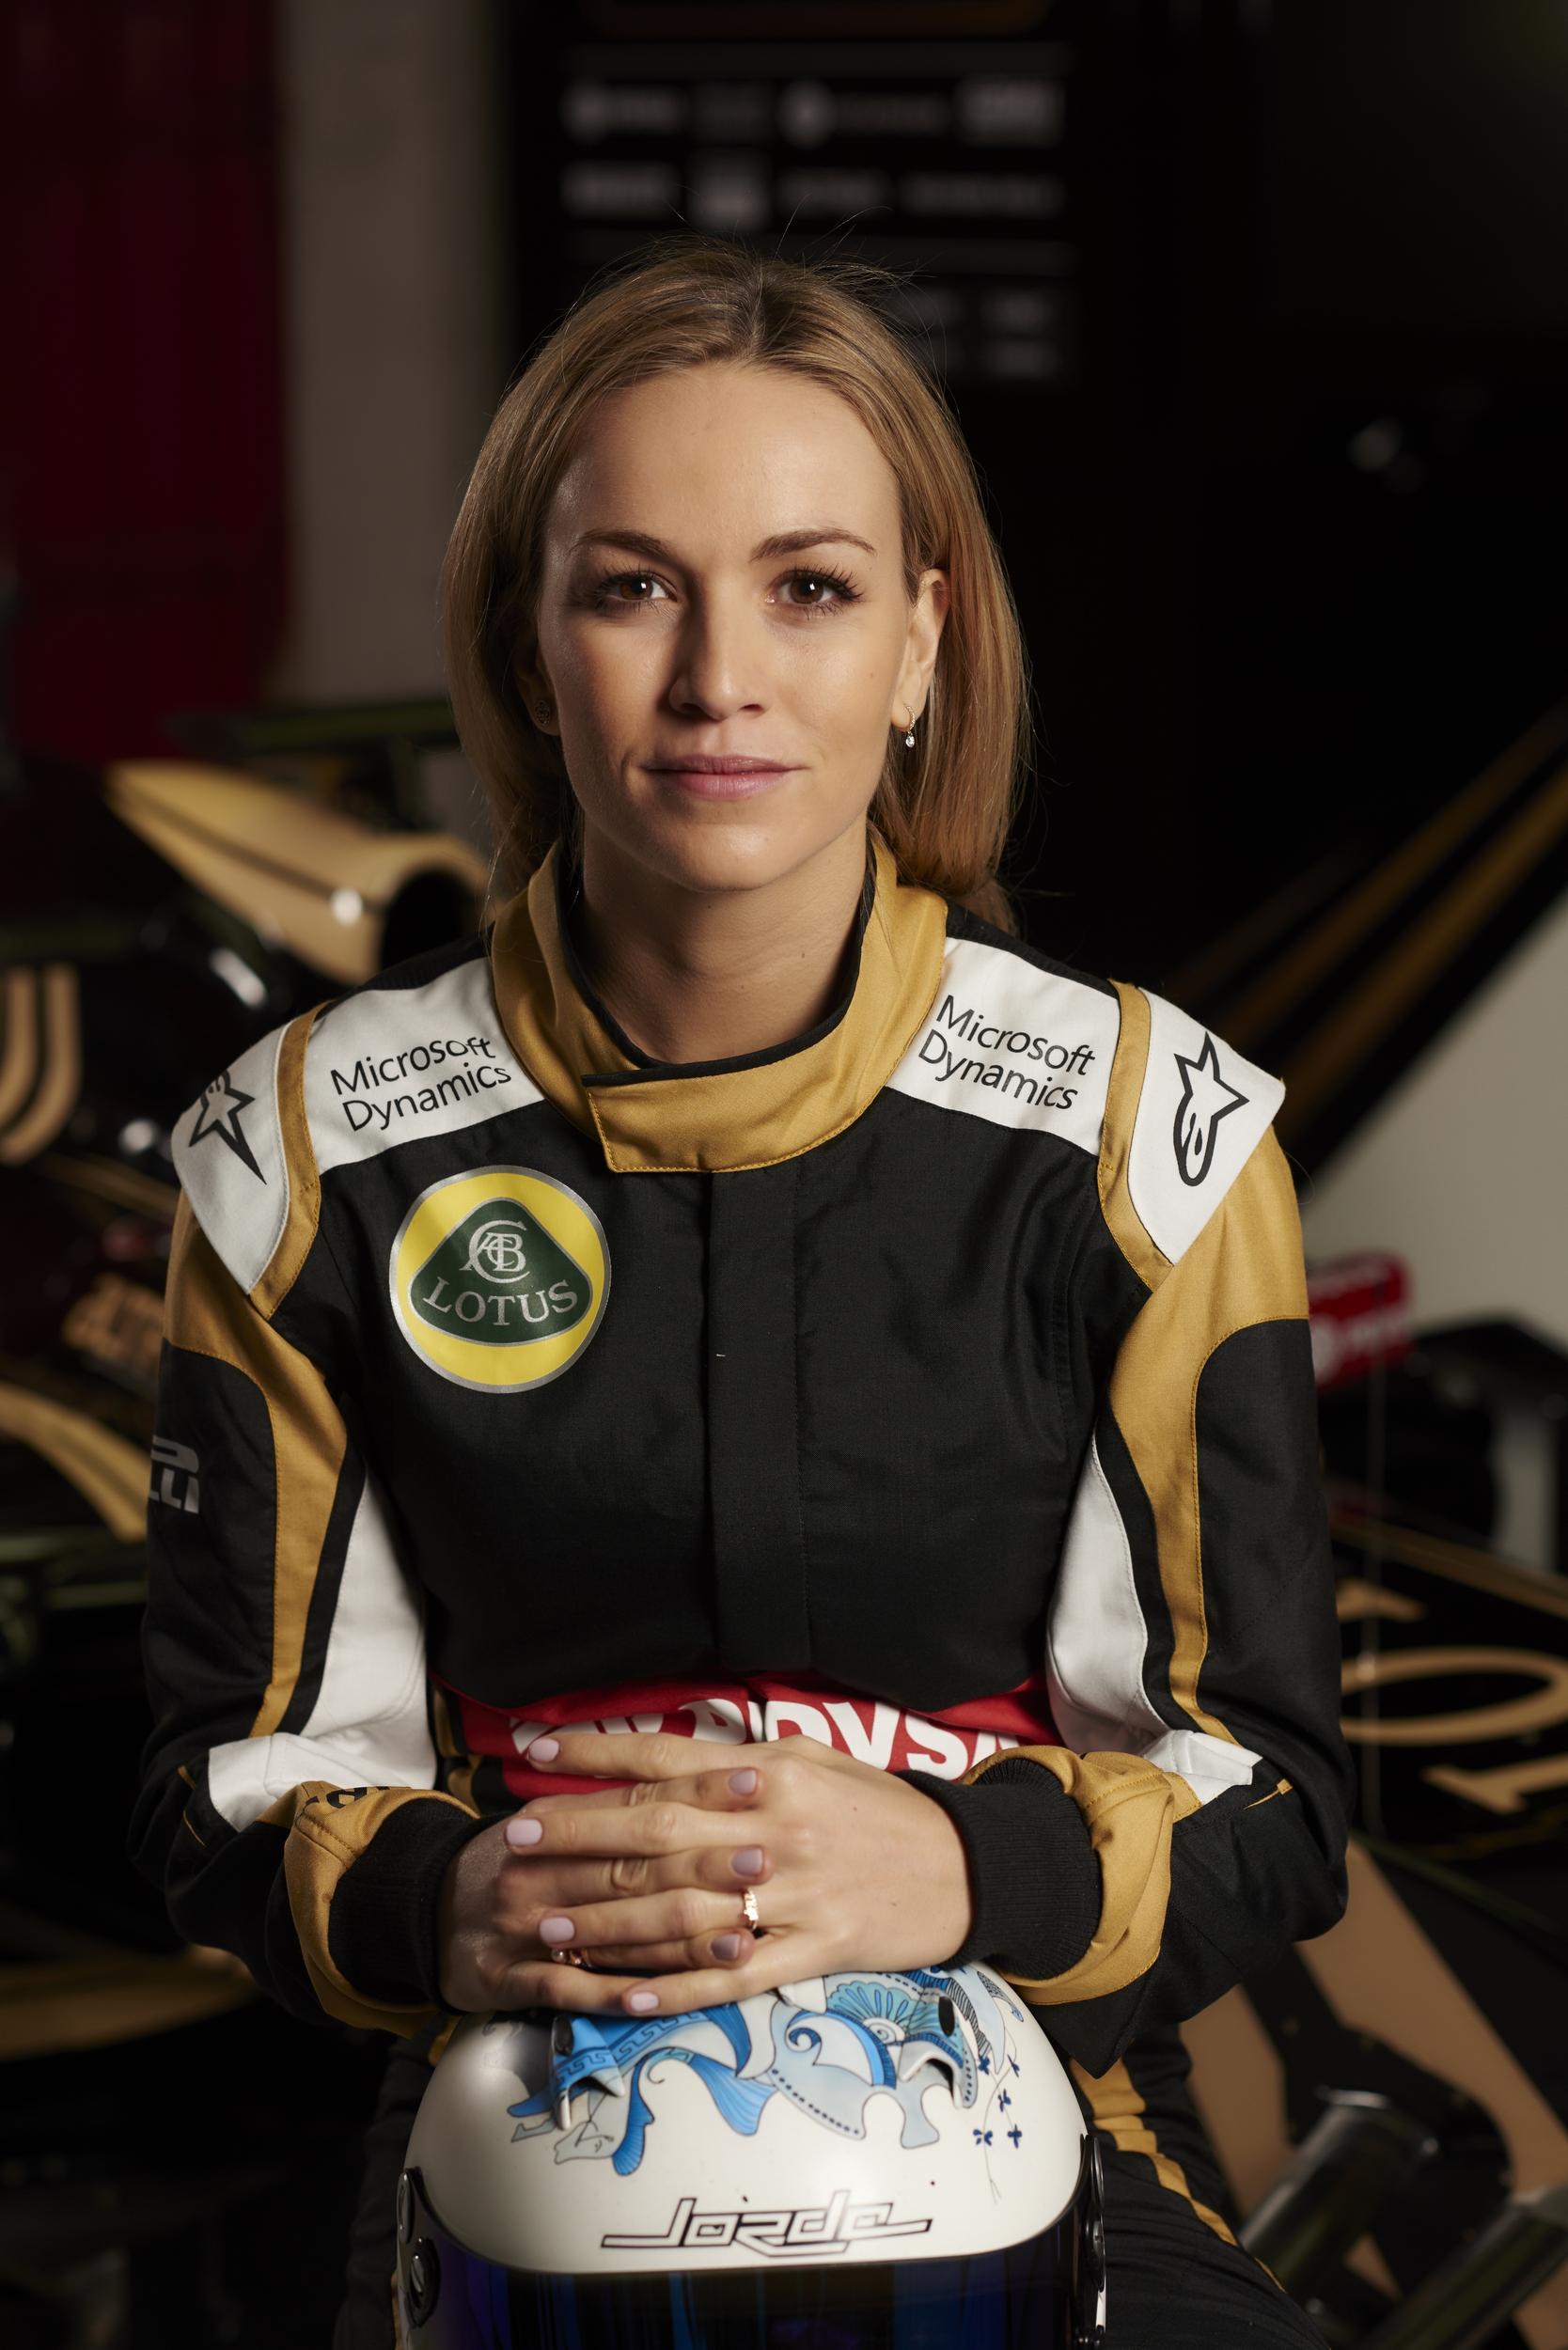 Lotus_Formula1_Carmen Jorda_0002